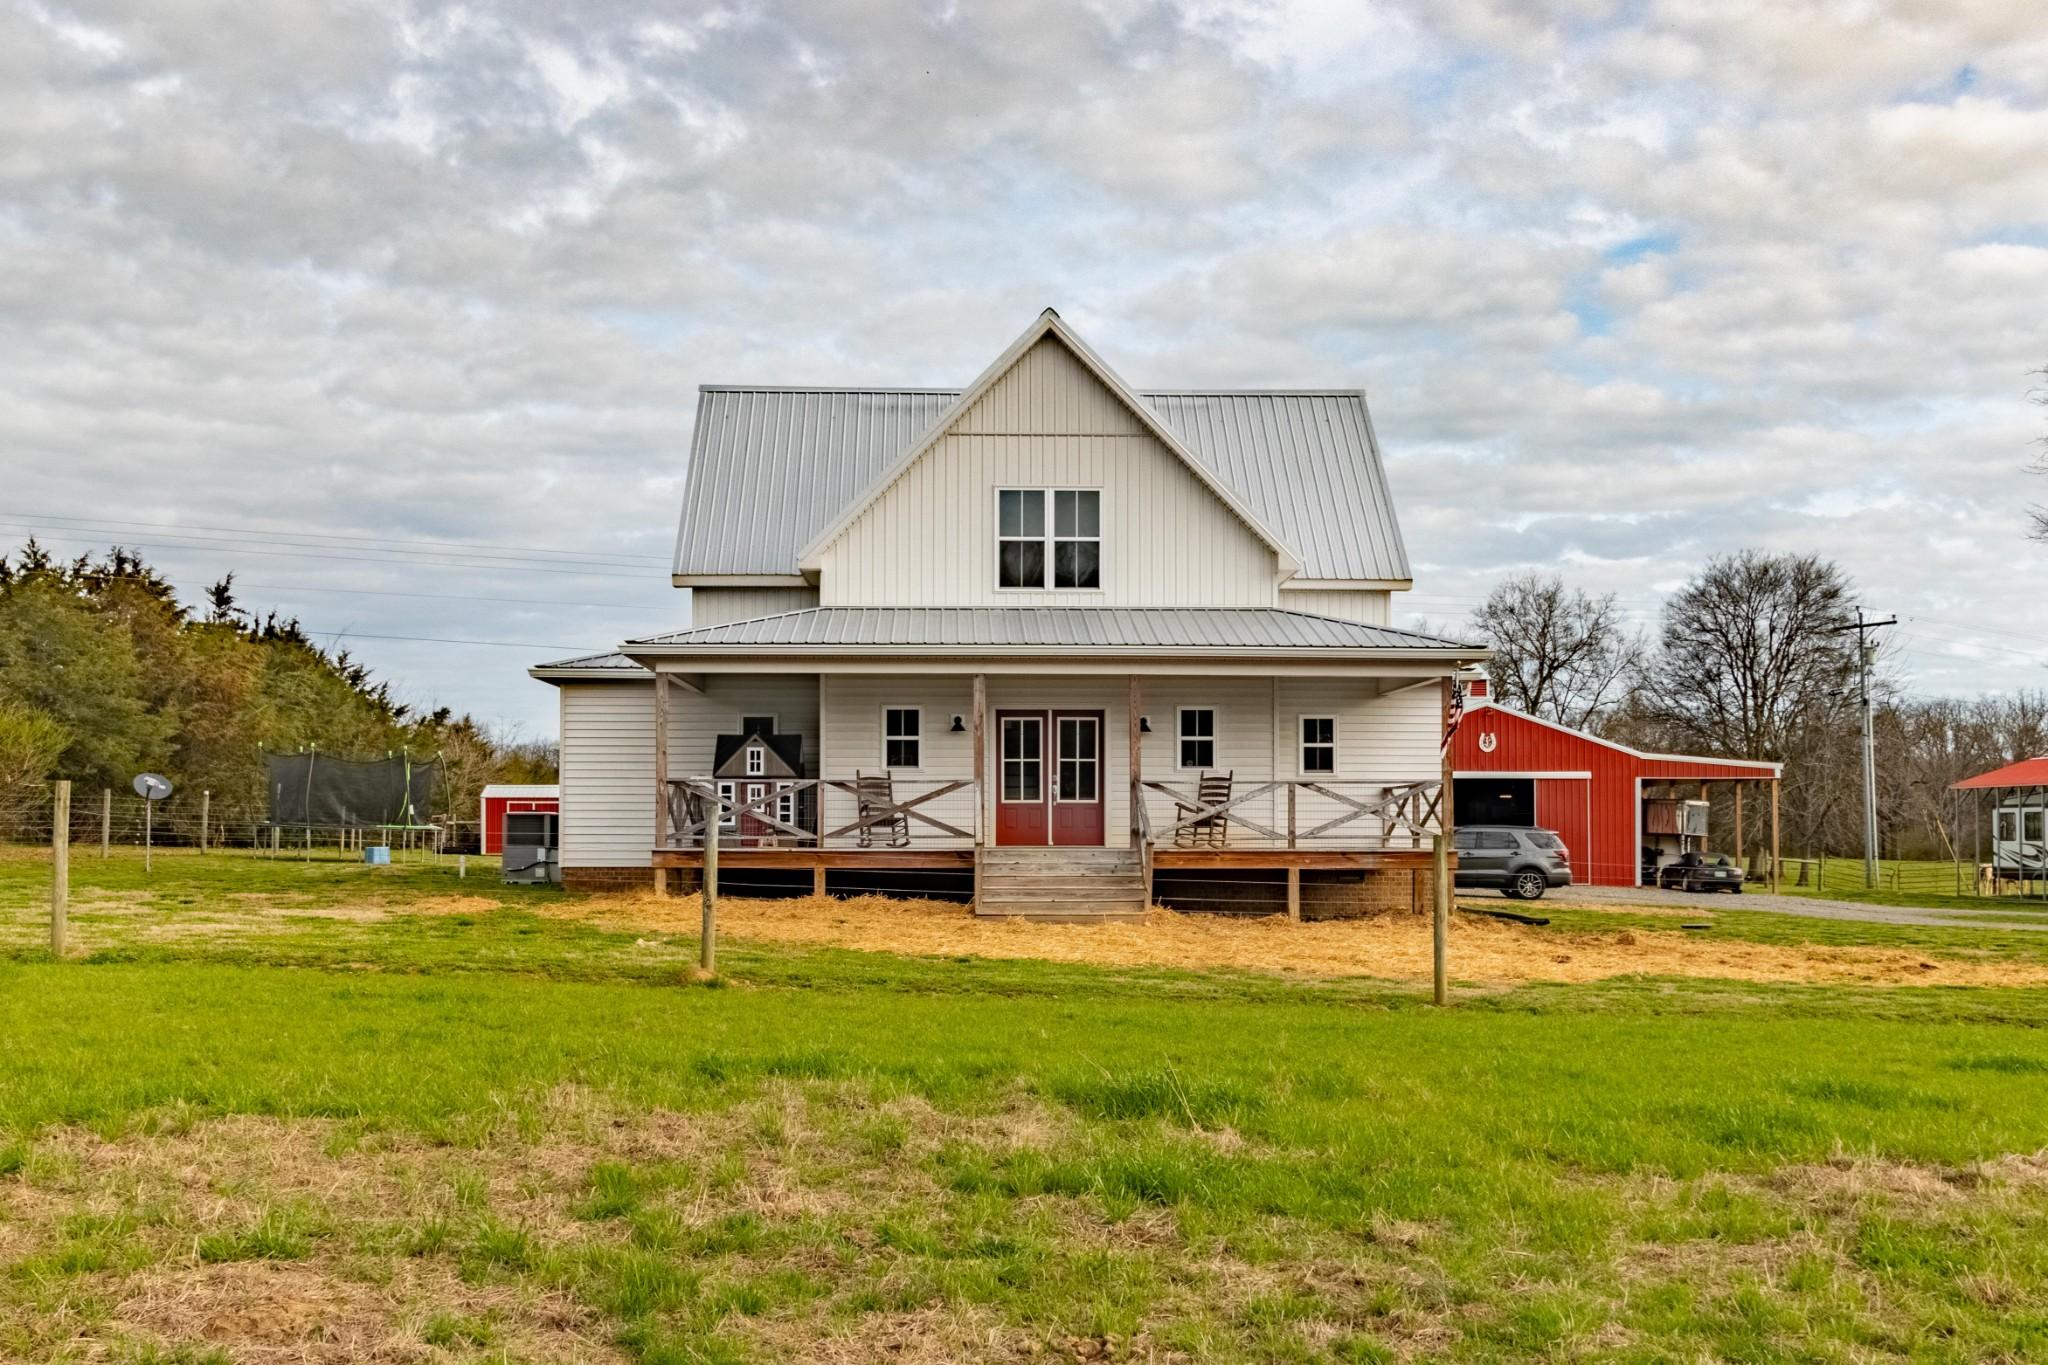 499 Haysland Rd Property Photo - Fayetteville, TN real estate listing